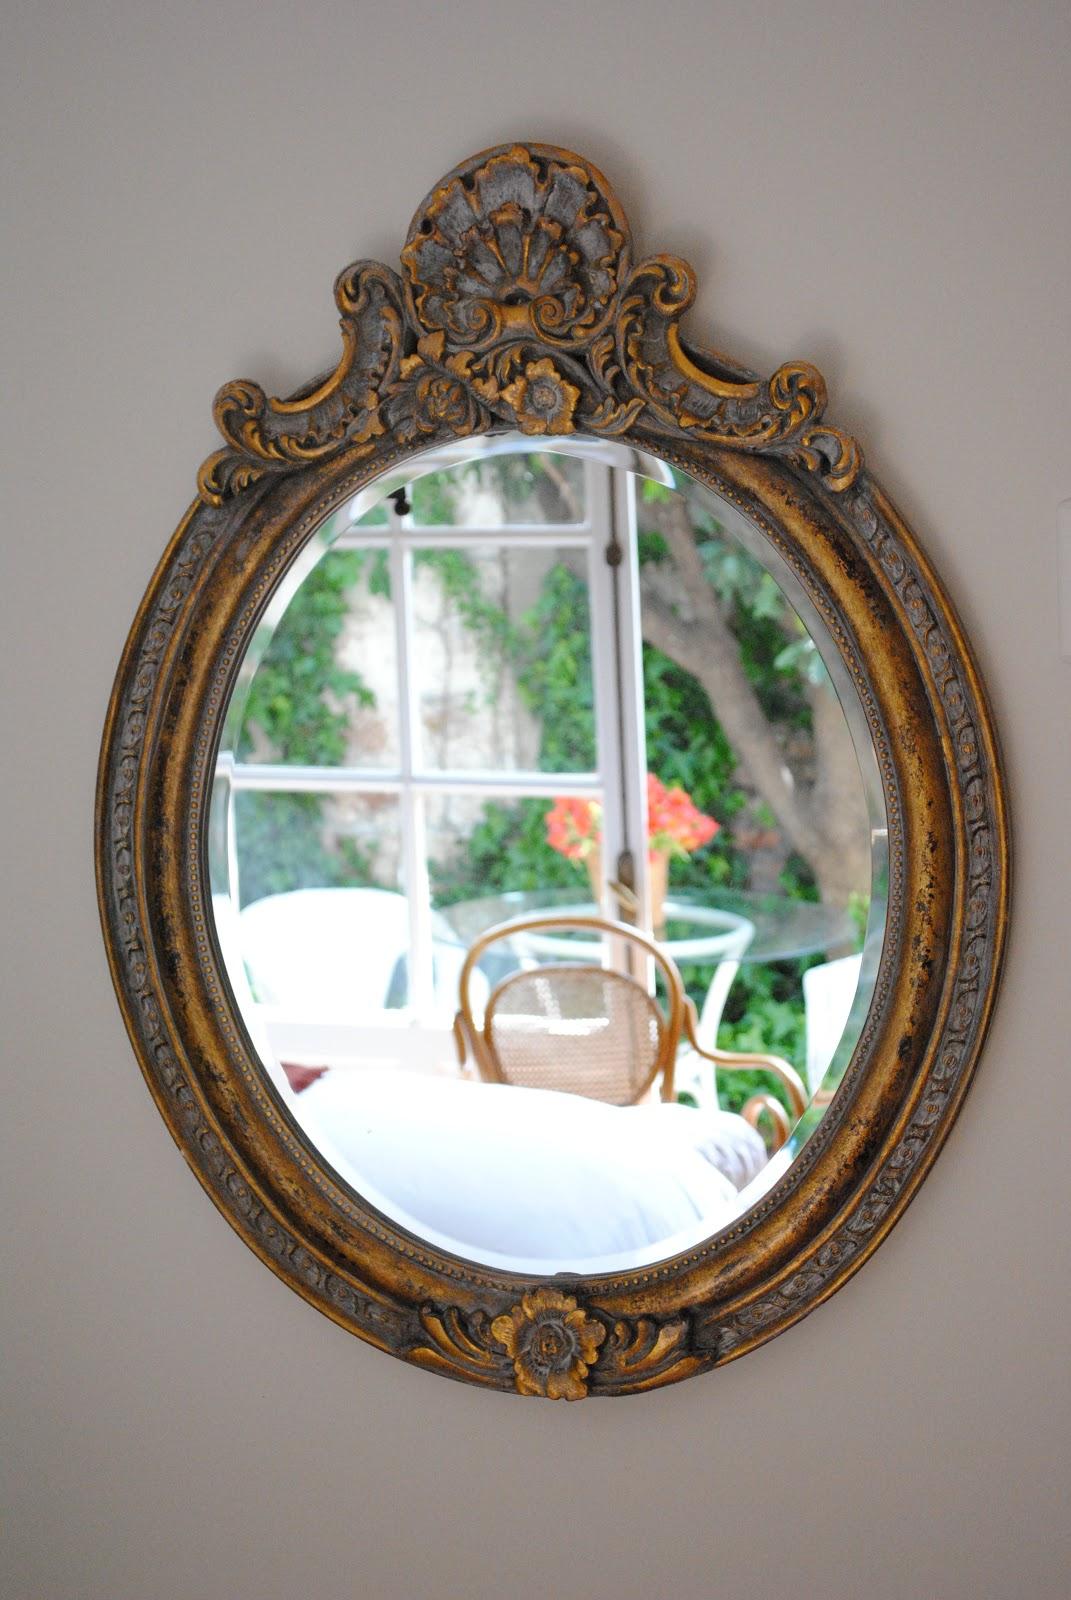 Paz montealegre decoraci n espejo coronaci n ovalados for Espejos dorados ovalados